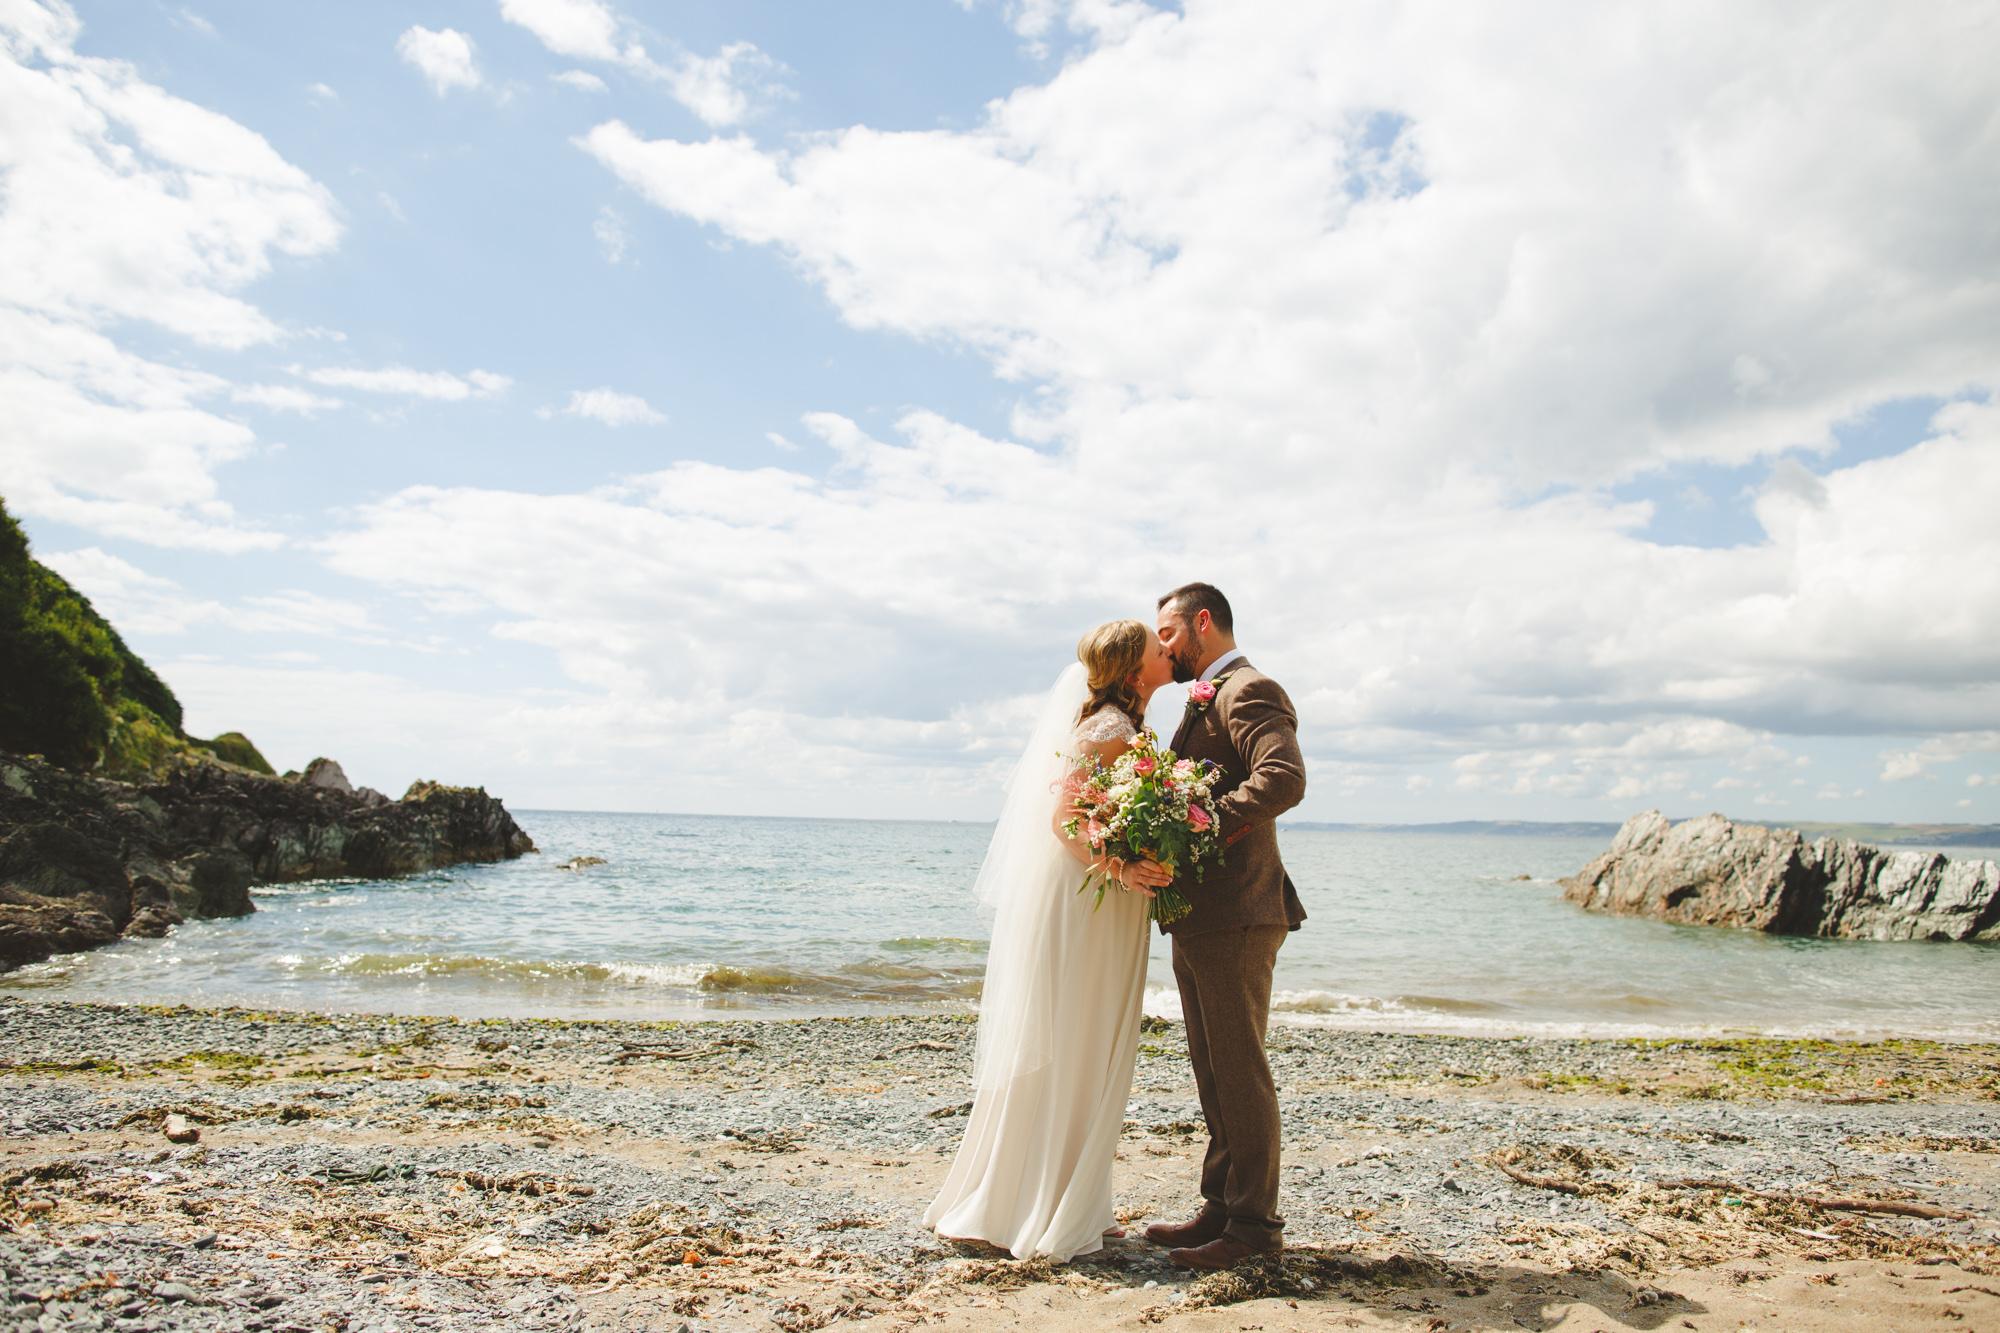 cornwall-alternative-wedding-photographer-beach-wedding-9.jpg